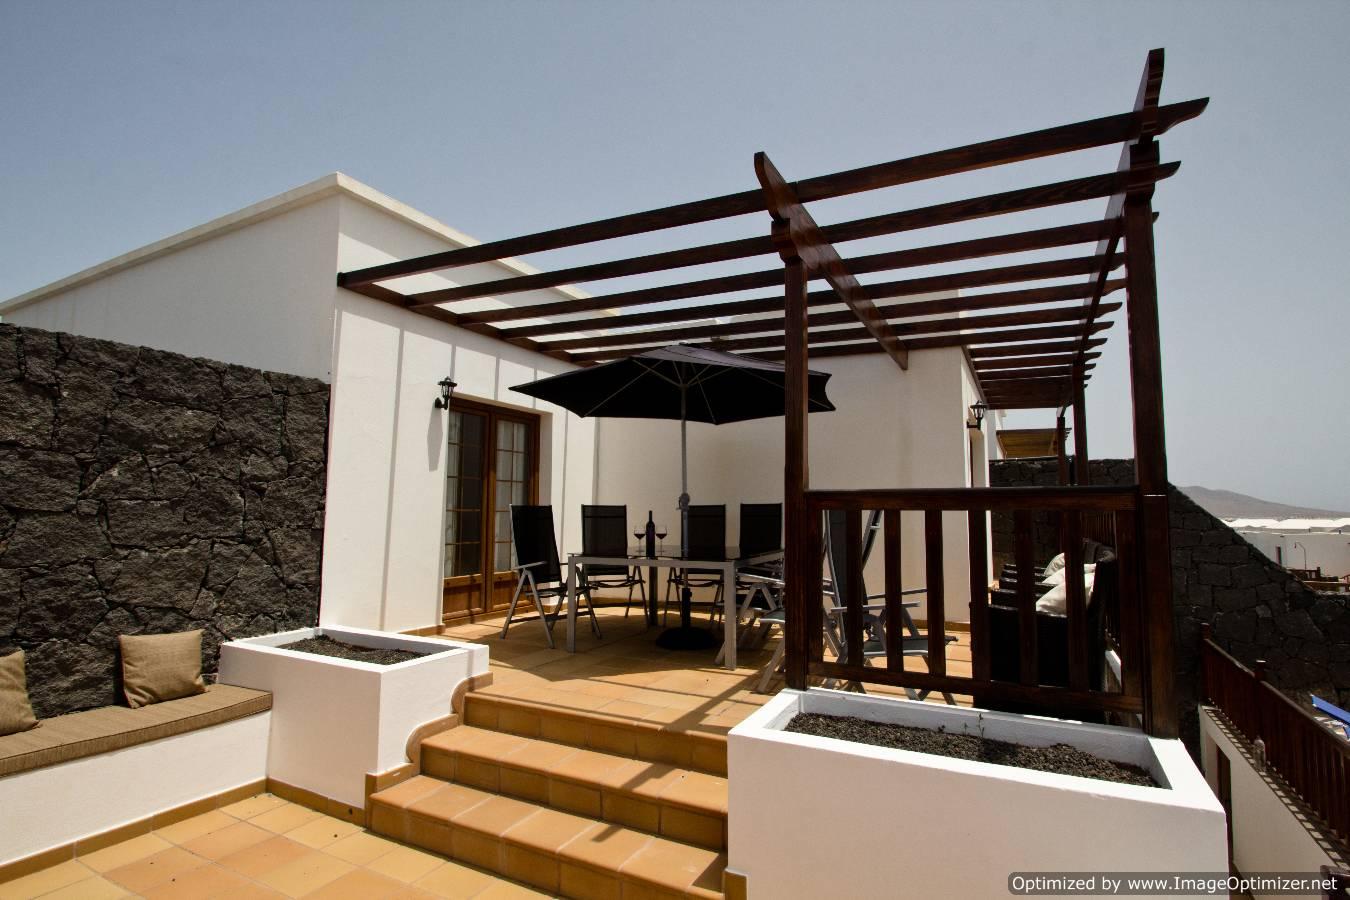 Villa LVC257974 Terrace for dining al fresco